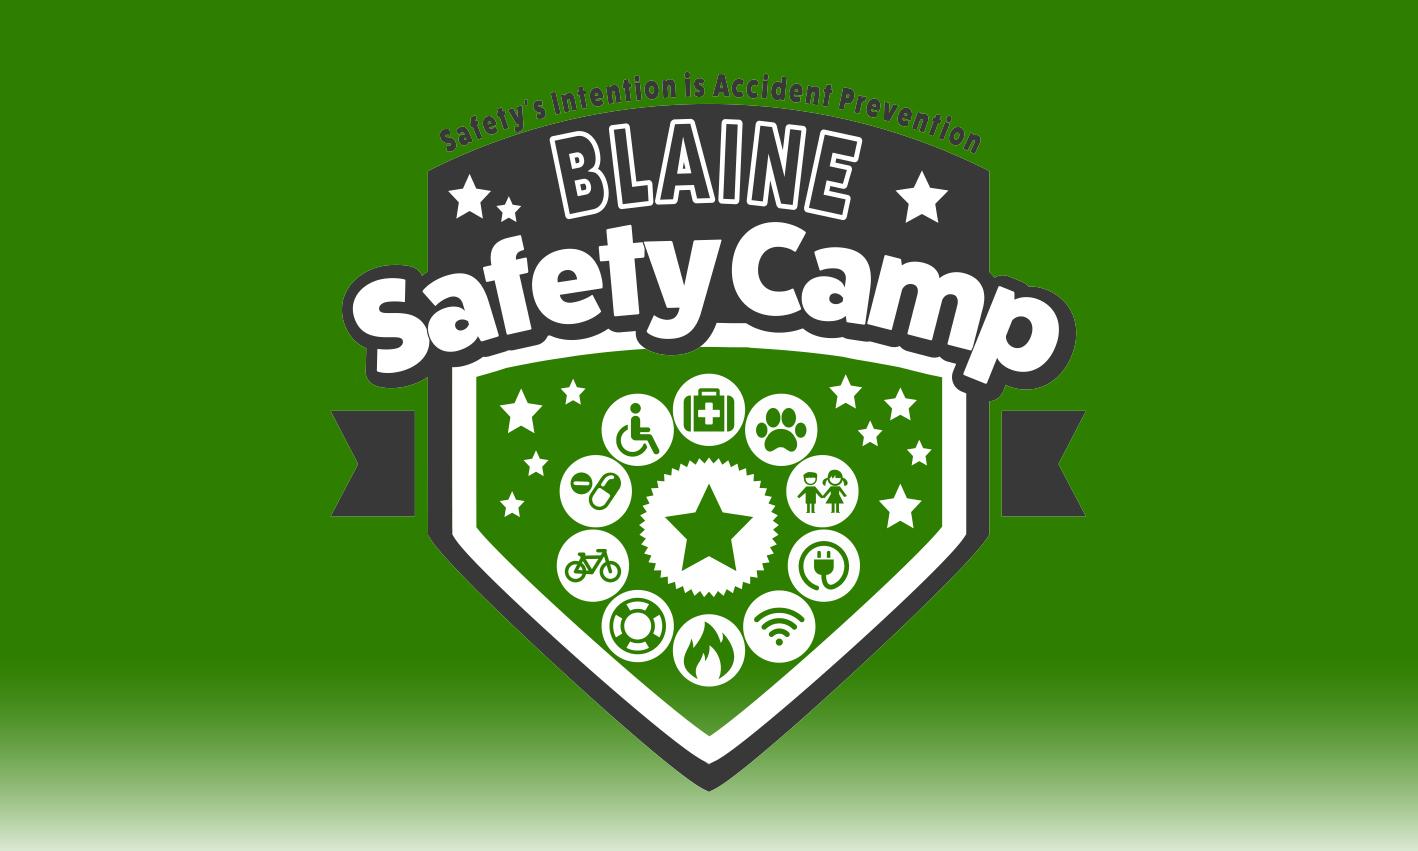 Safety Camp Green Logo Design